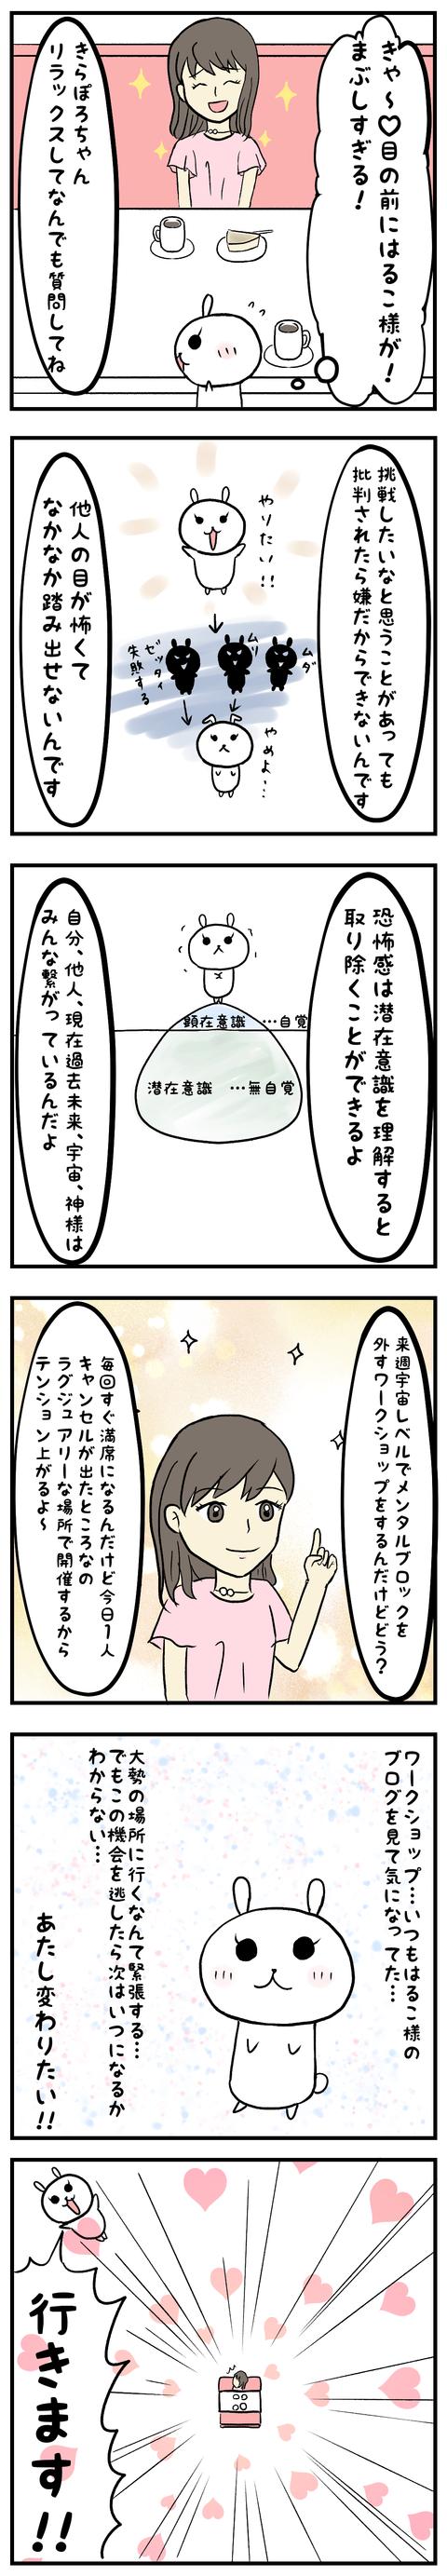 manga-yuzuporo05-1